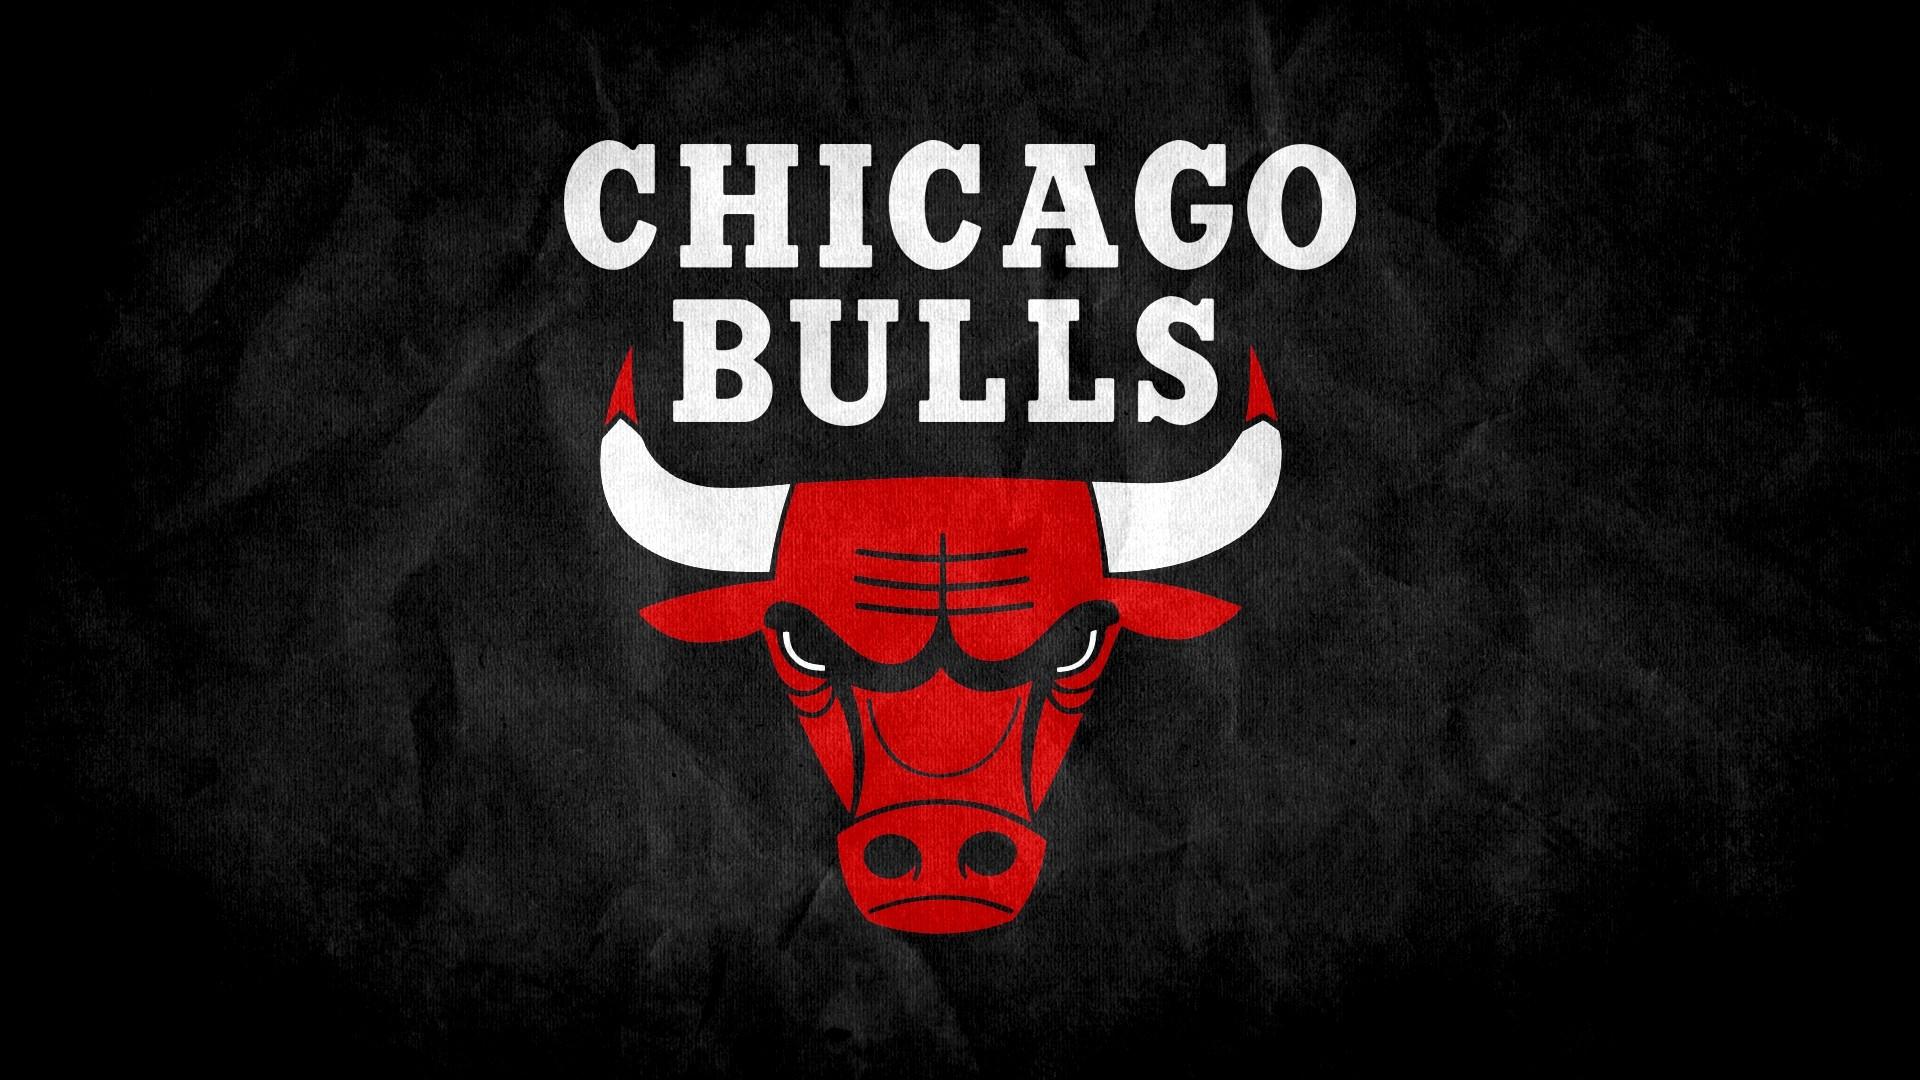 Chicago Bulls Wallpaper Hd Wallpapertag